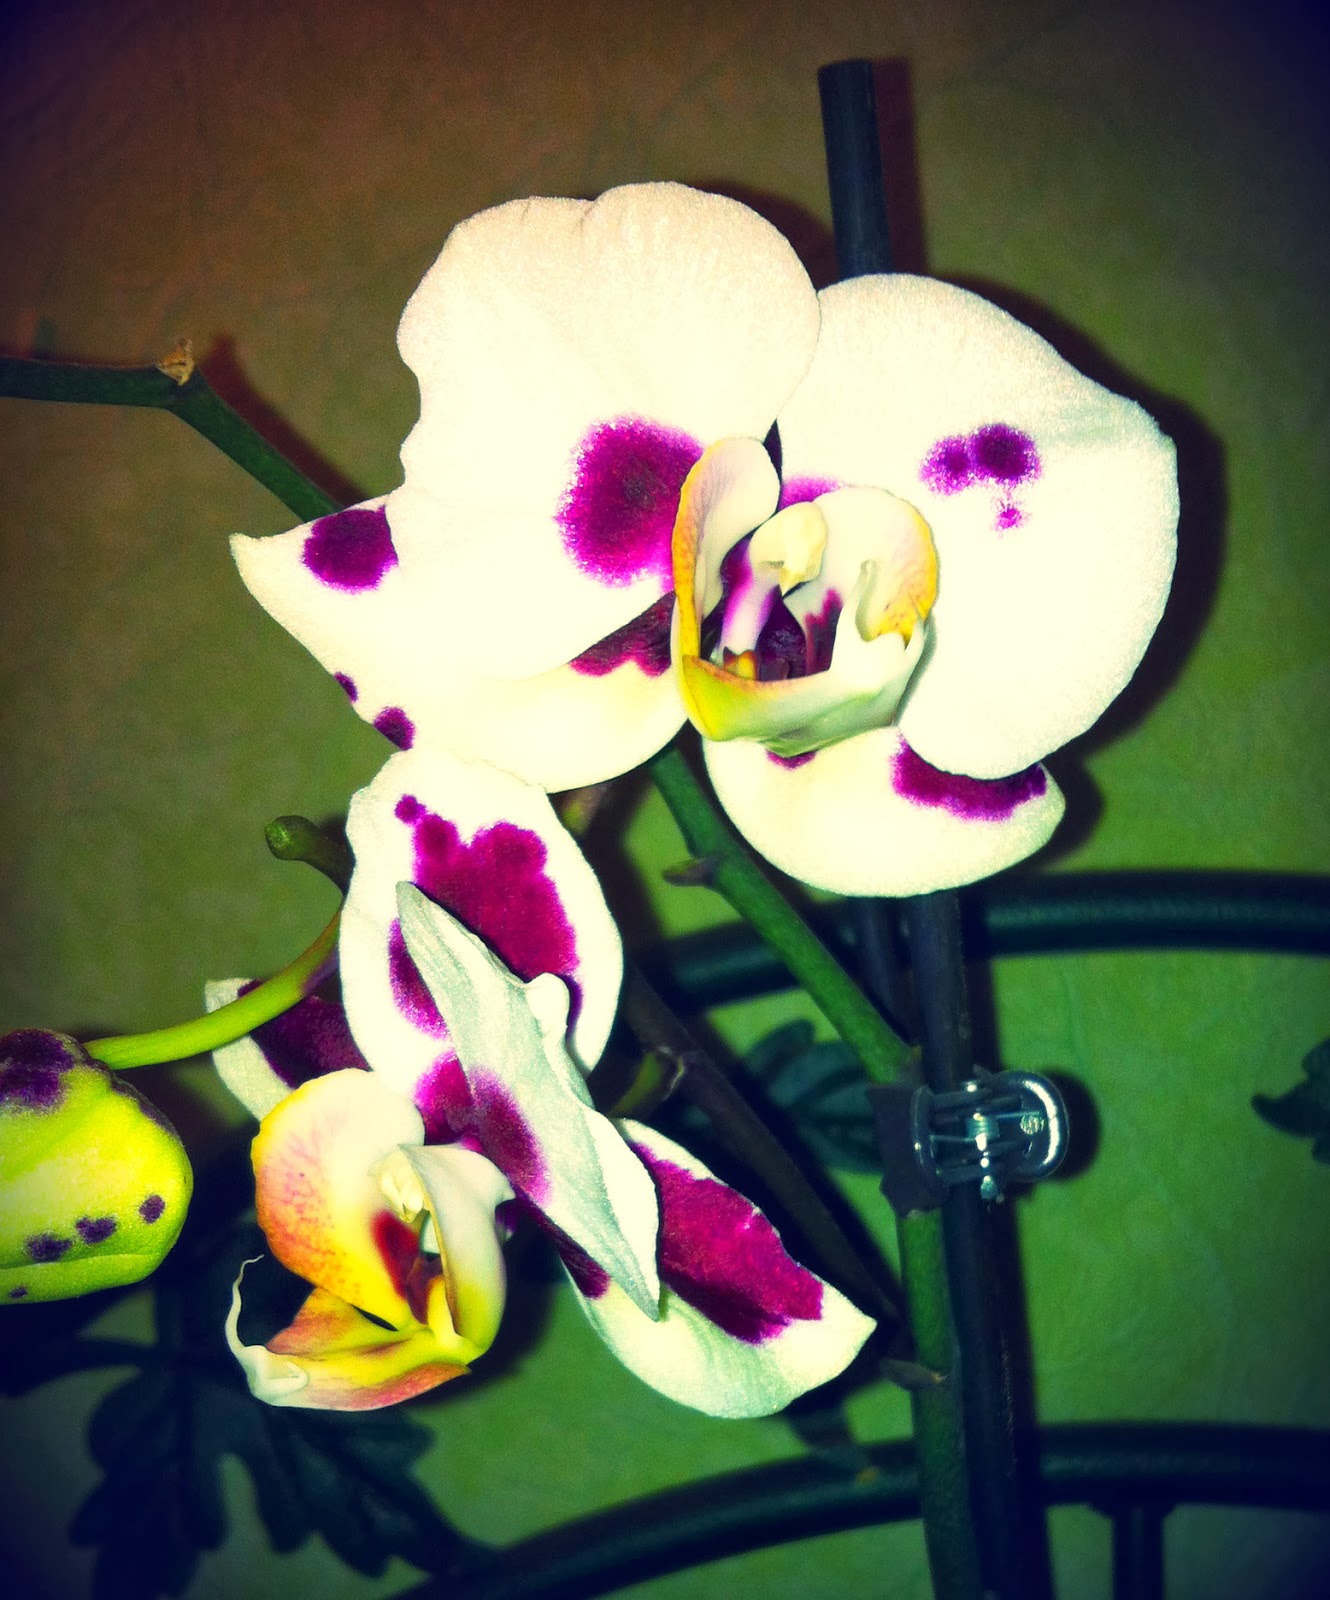 initiales gg jardin comment faire refleurir une orchid e. Black Bedroom Furniture Sets. Home Design Ideas